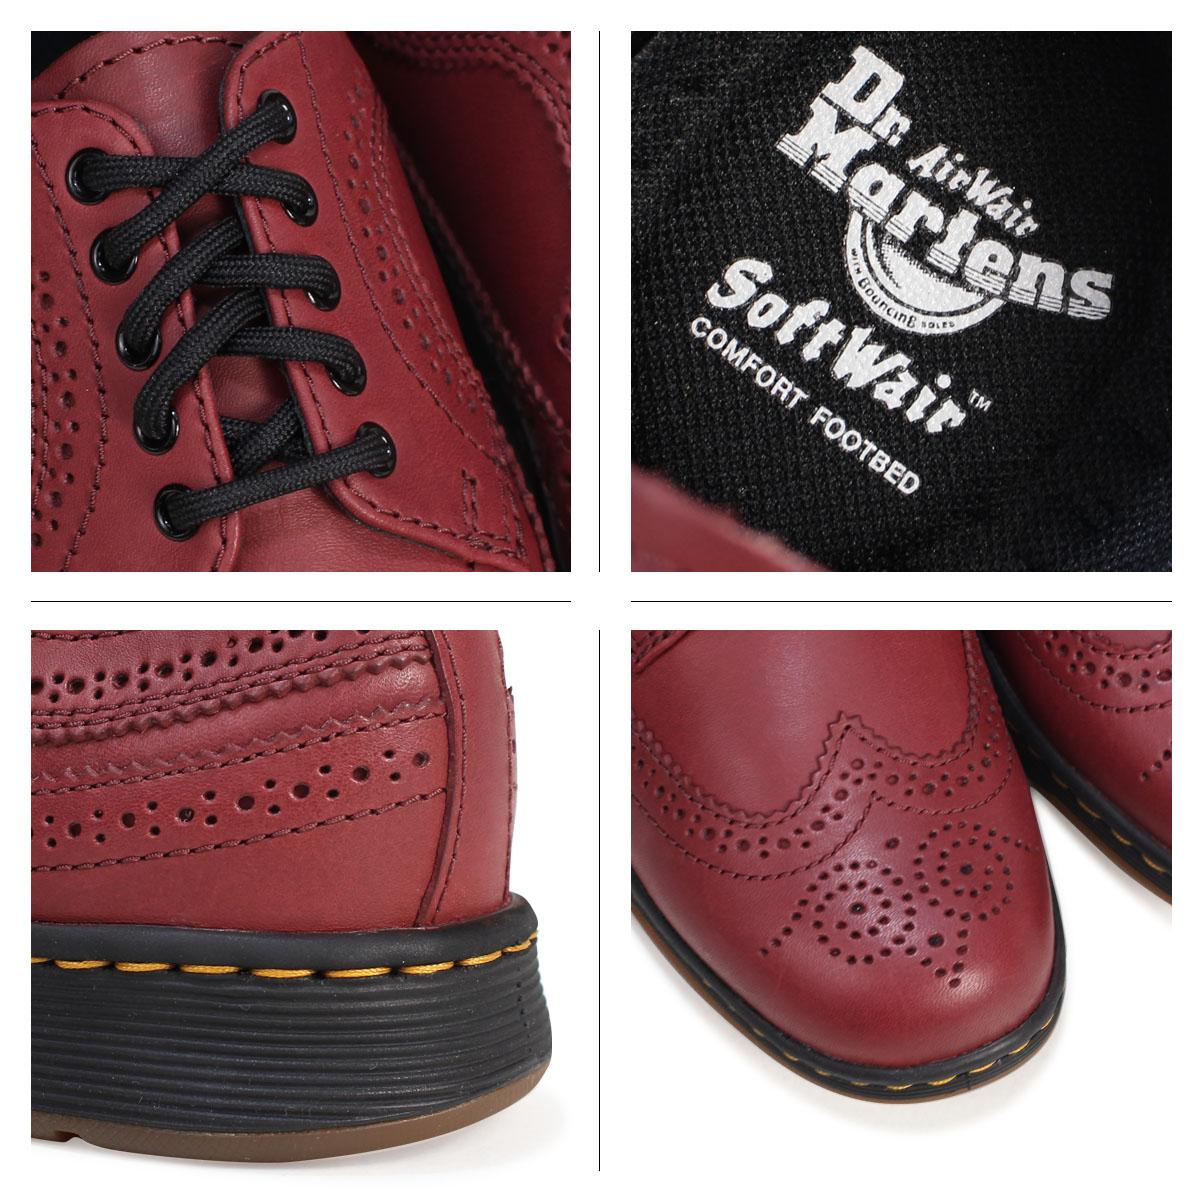 Allsports Dr Martens Wing Tip Men Gap Dis Doctor Martin Shoes Dms